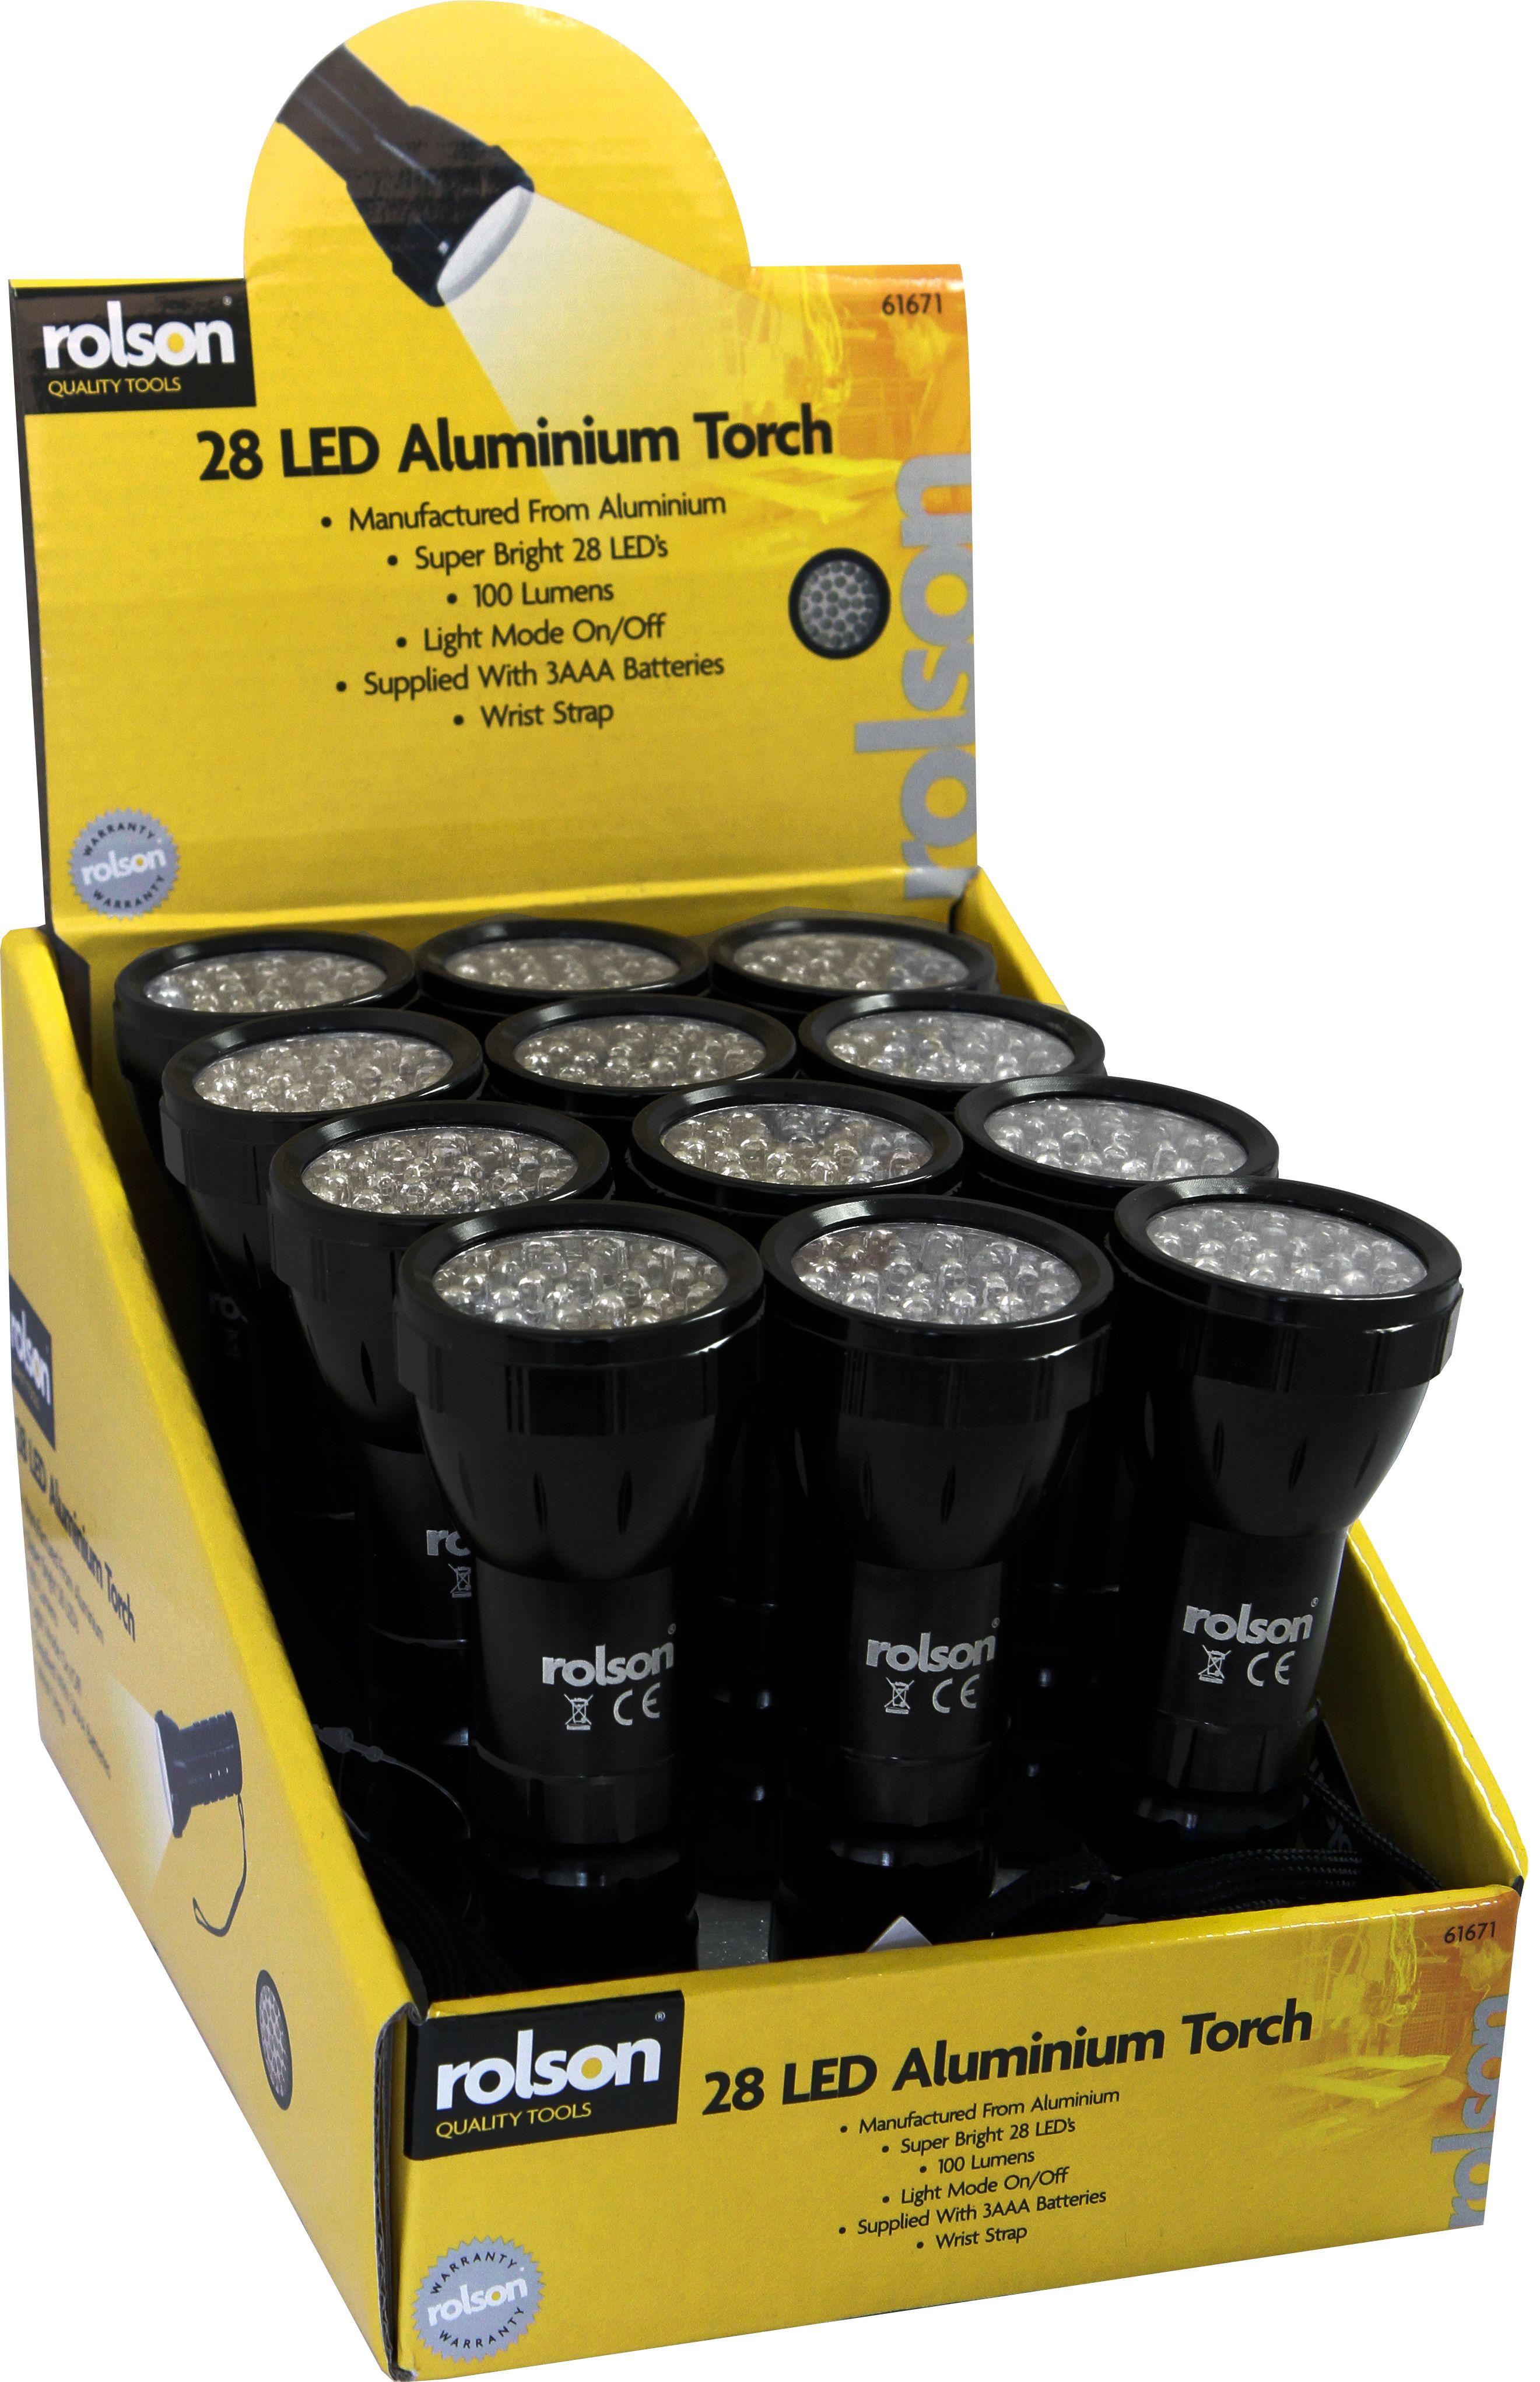 Rolson 61671 28 LED Aluminium Torch